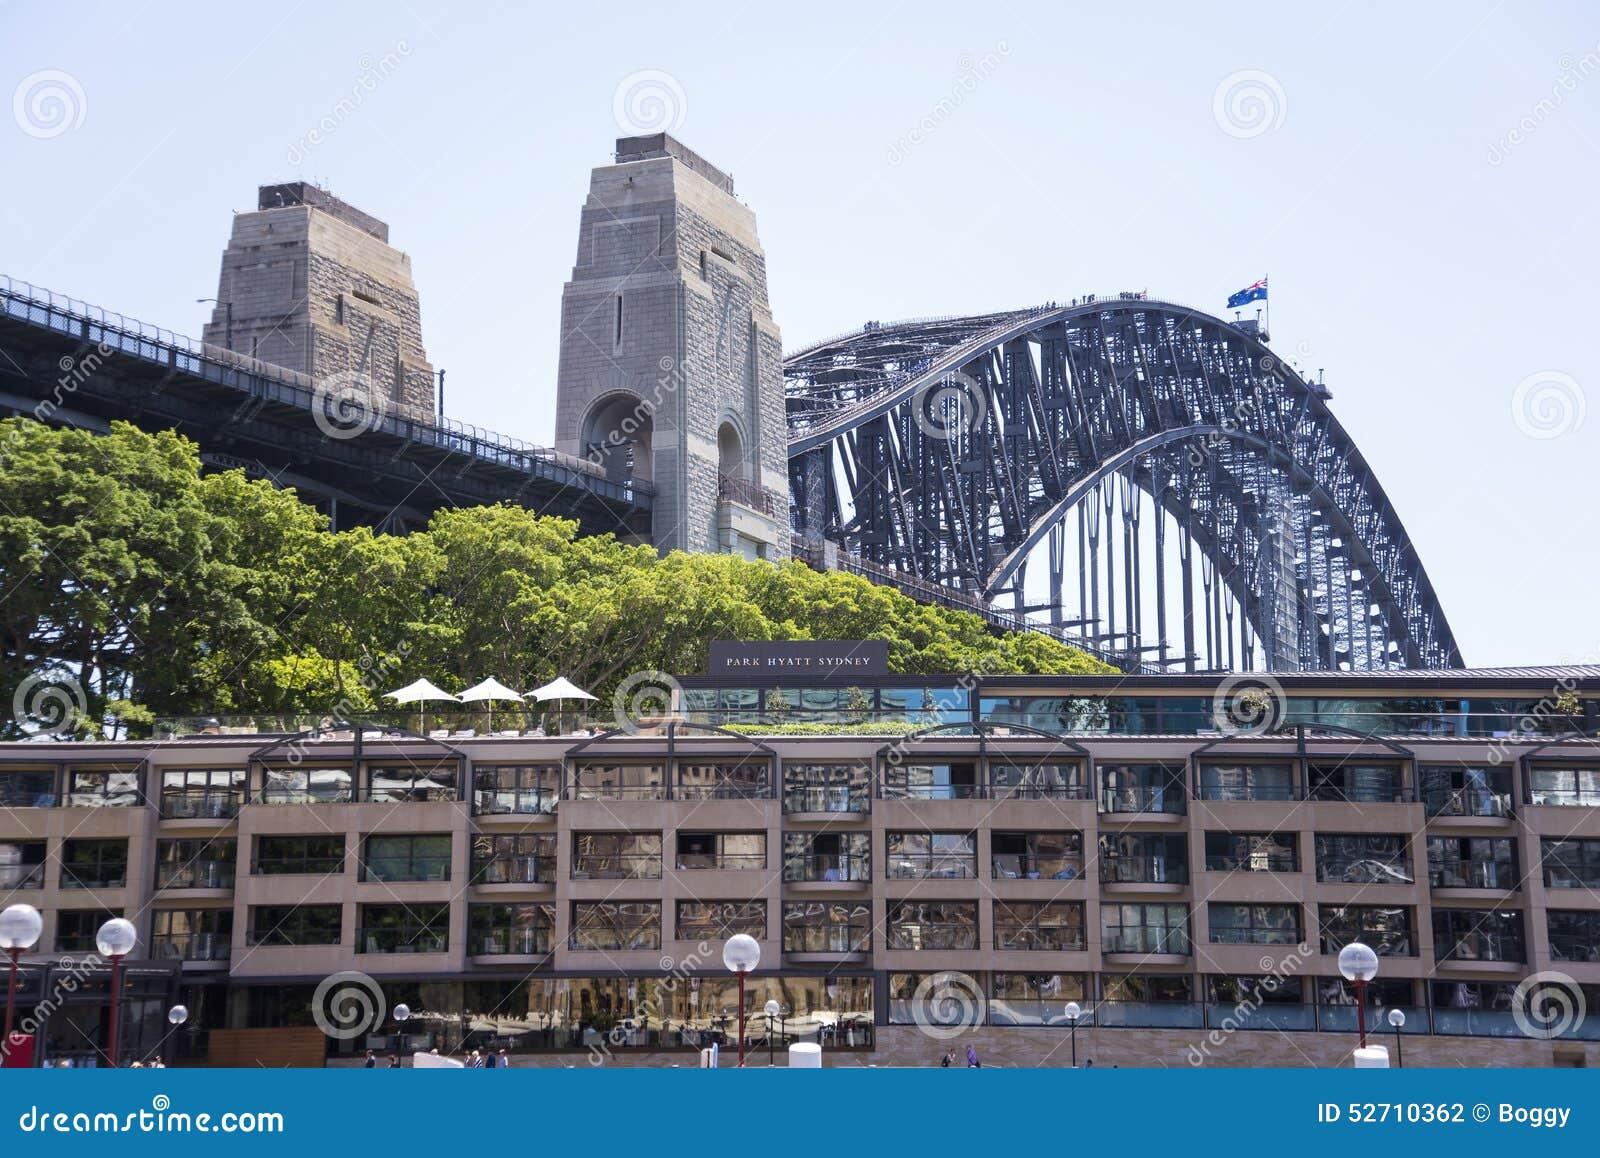 Hotel Park Hyatt Sydney Editorial Photography Image Of Harbor